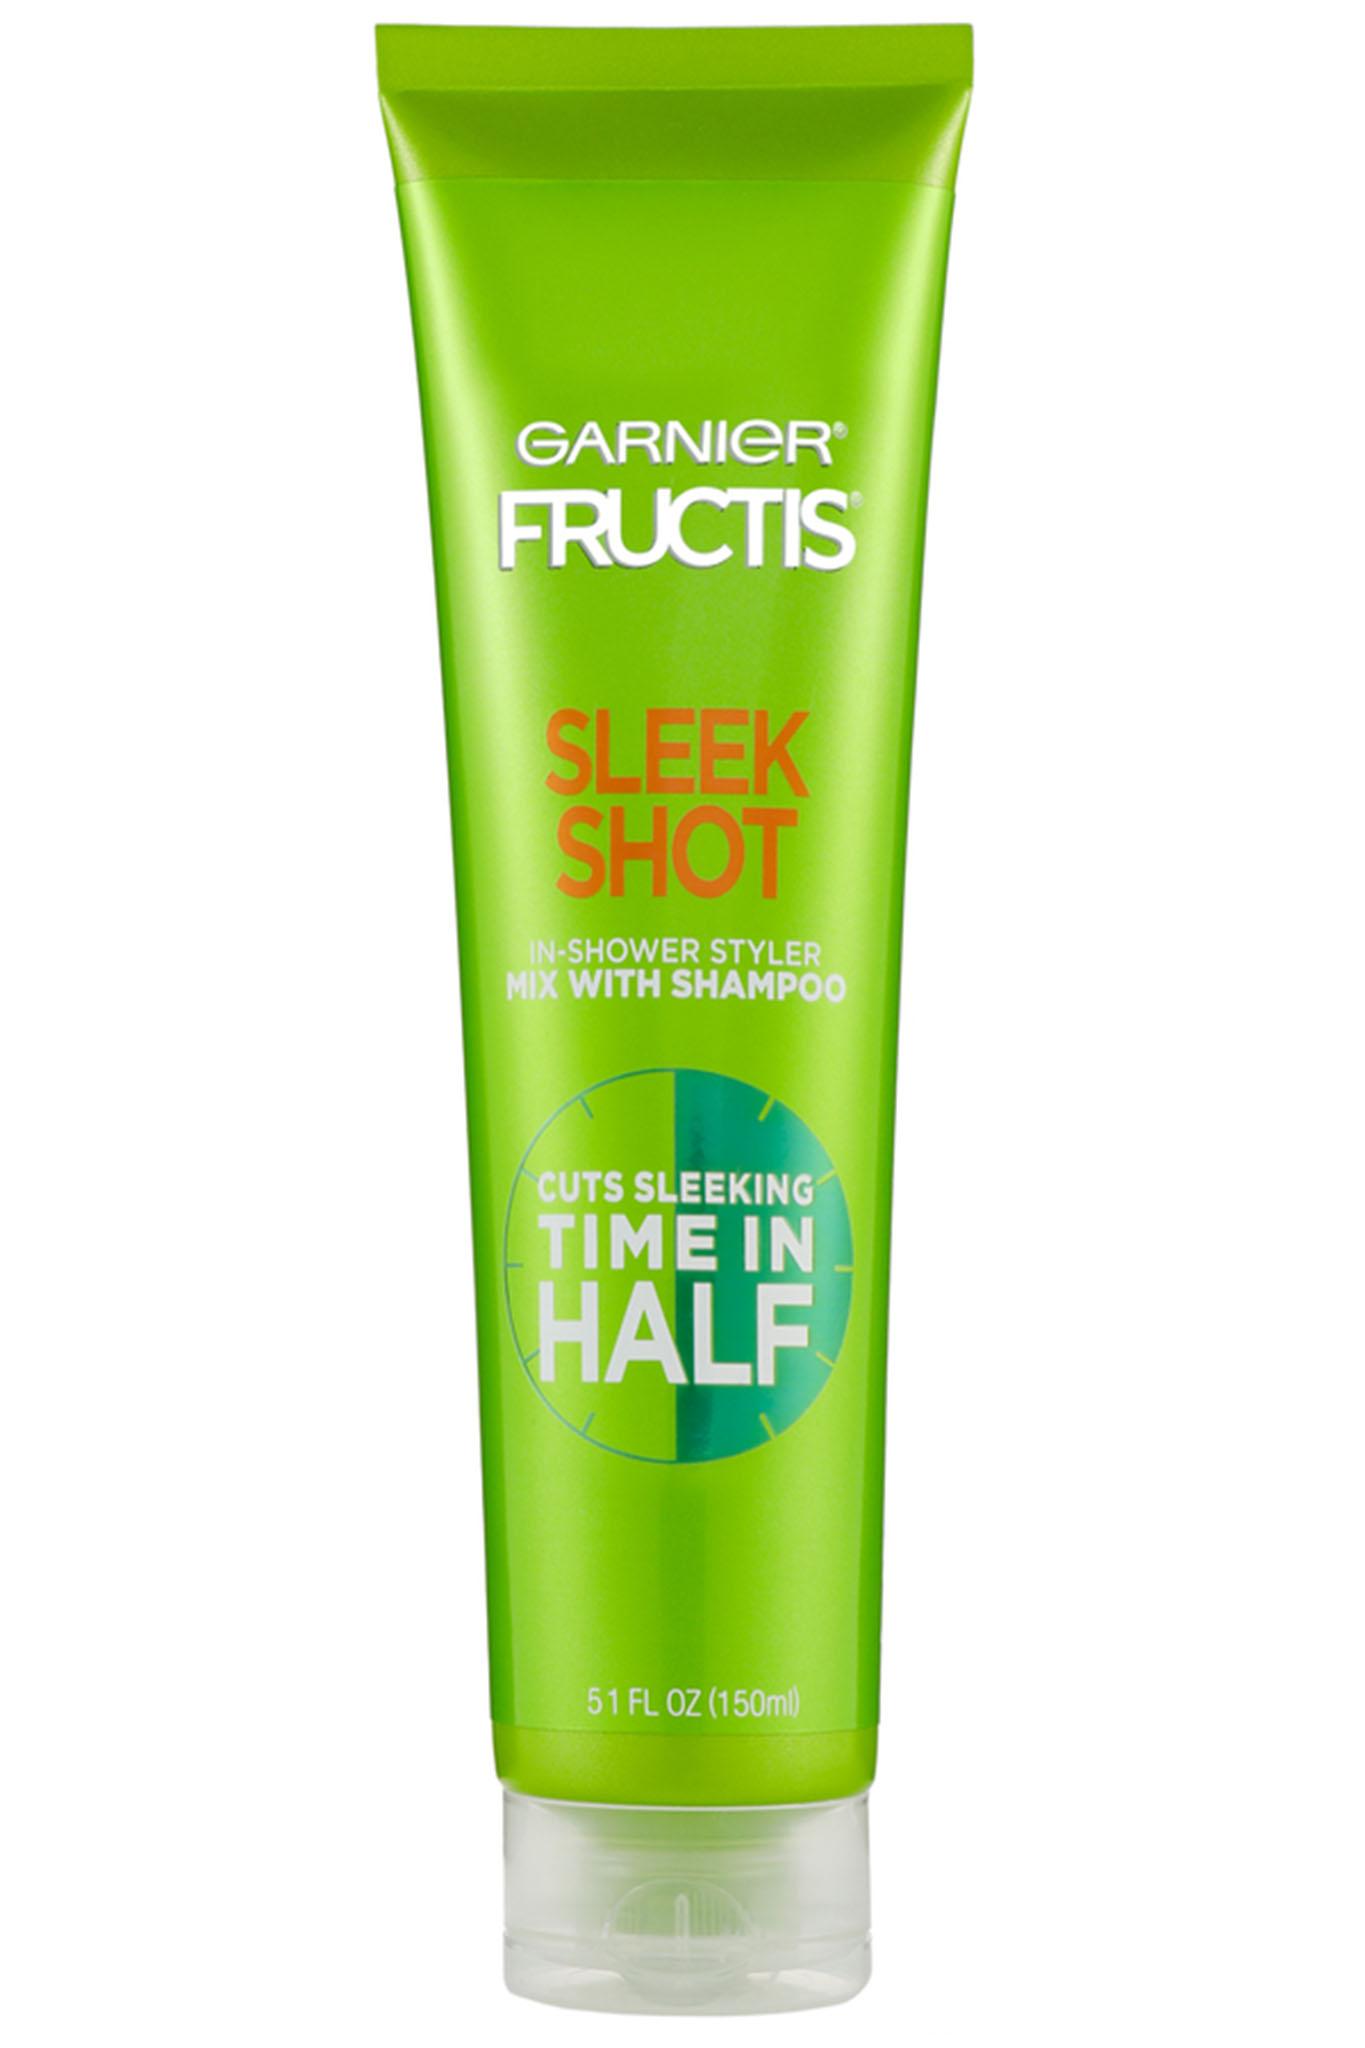 Garnier Fructis Sleek Shot